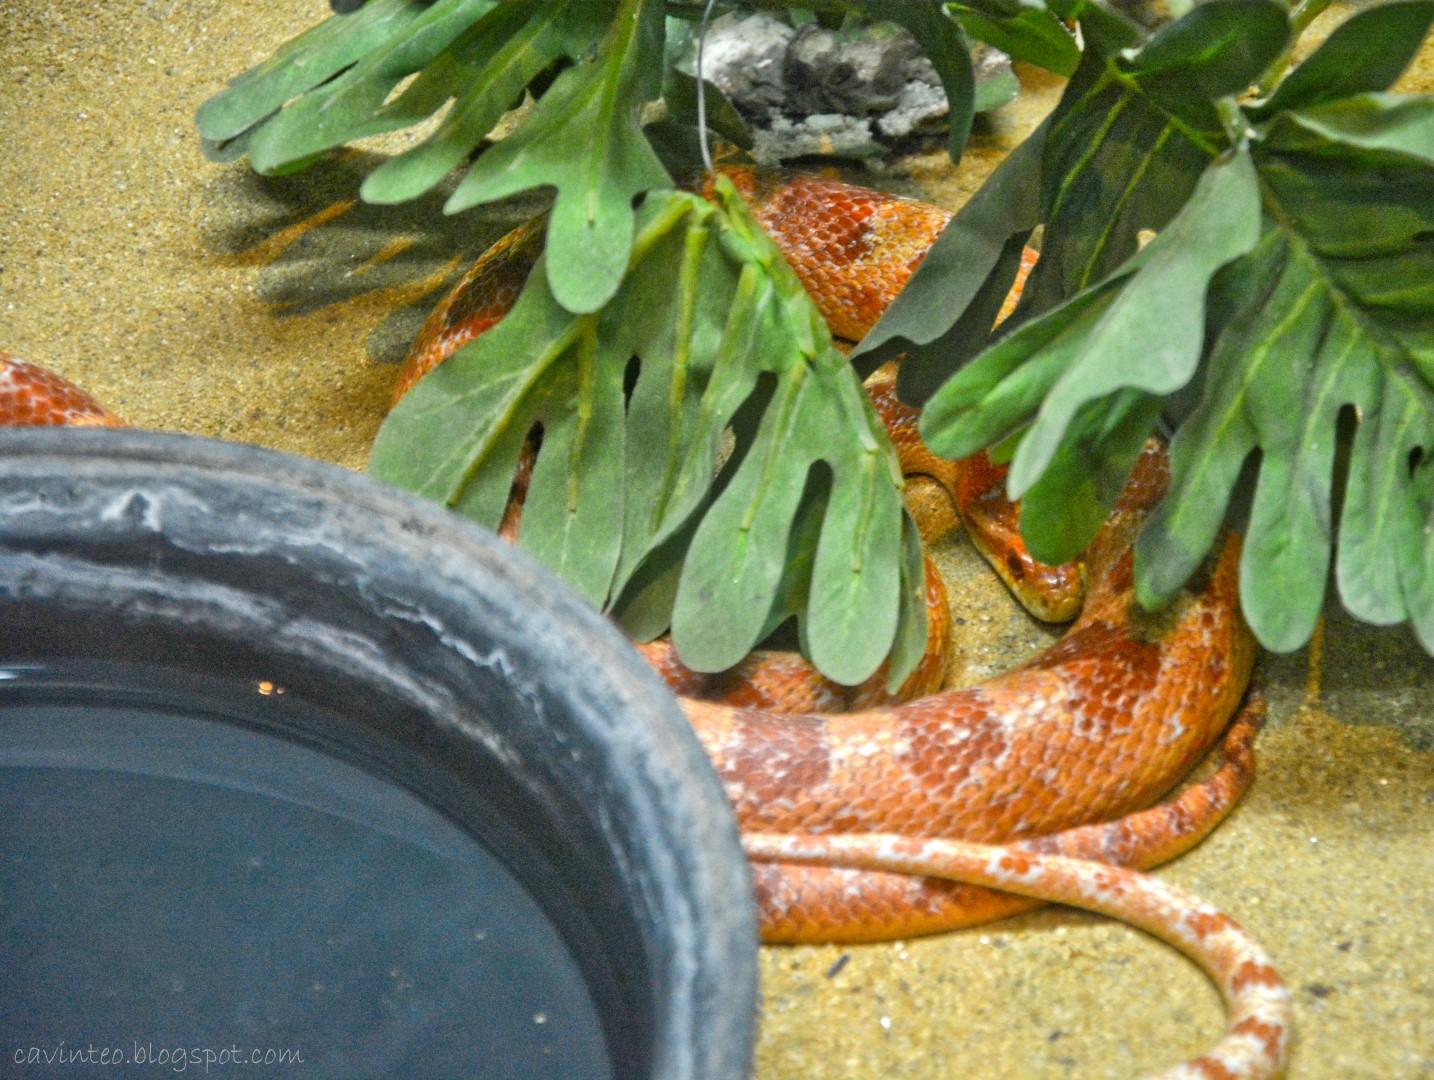 A 2 Z Reptiles Entree Kibbles:...